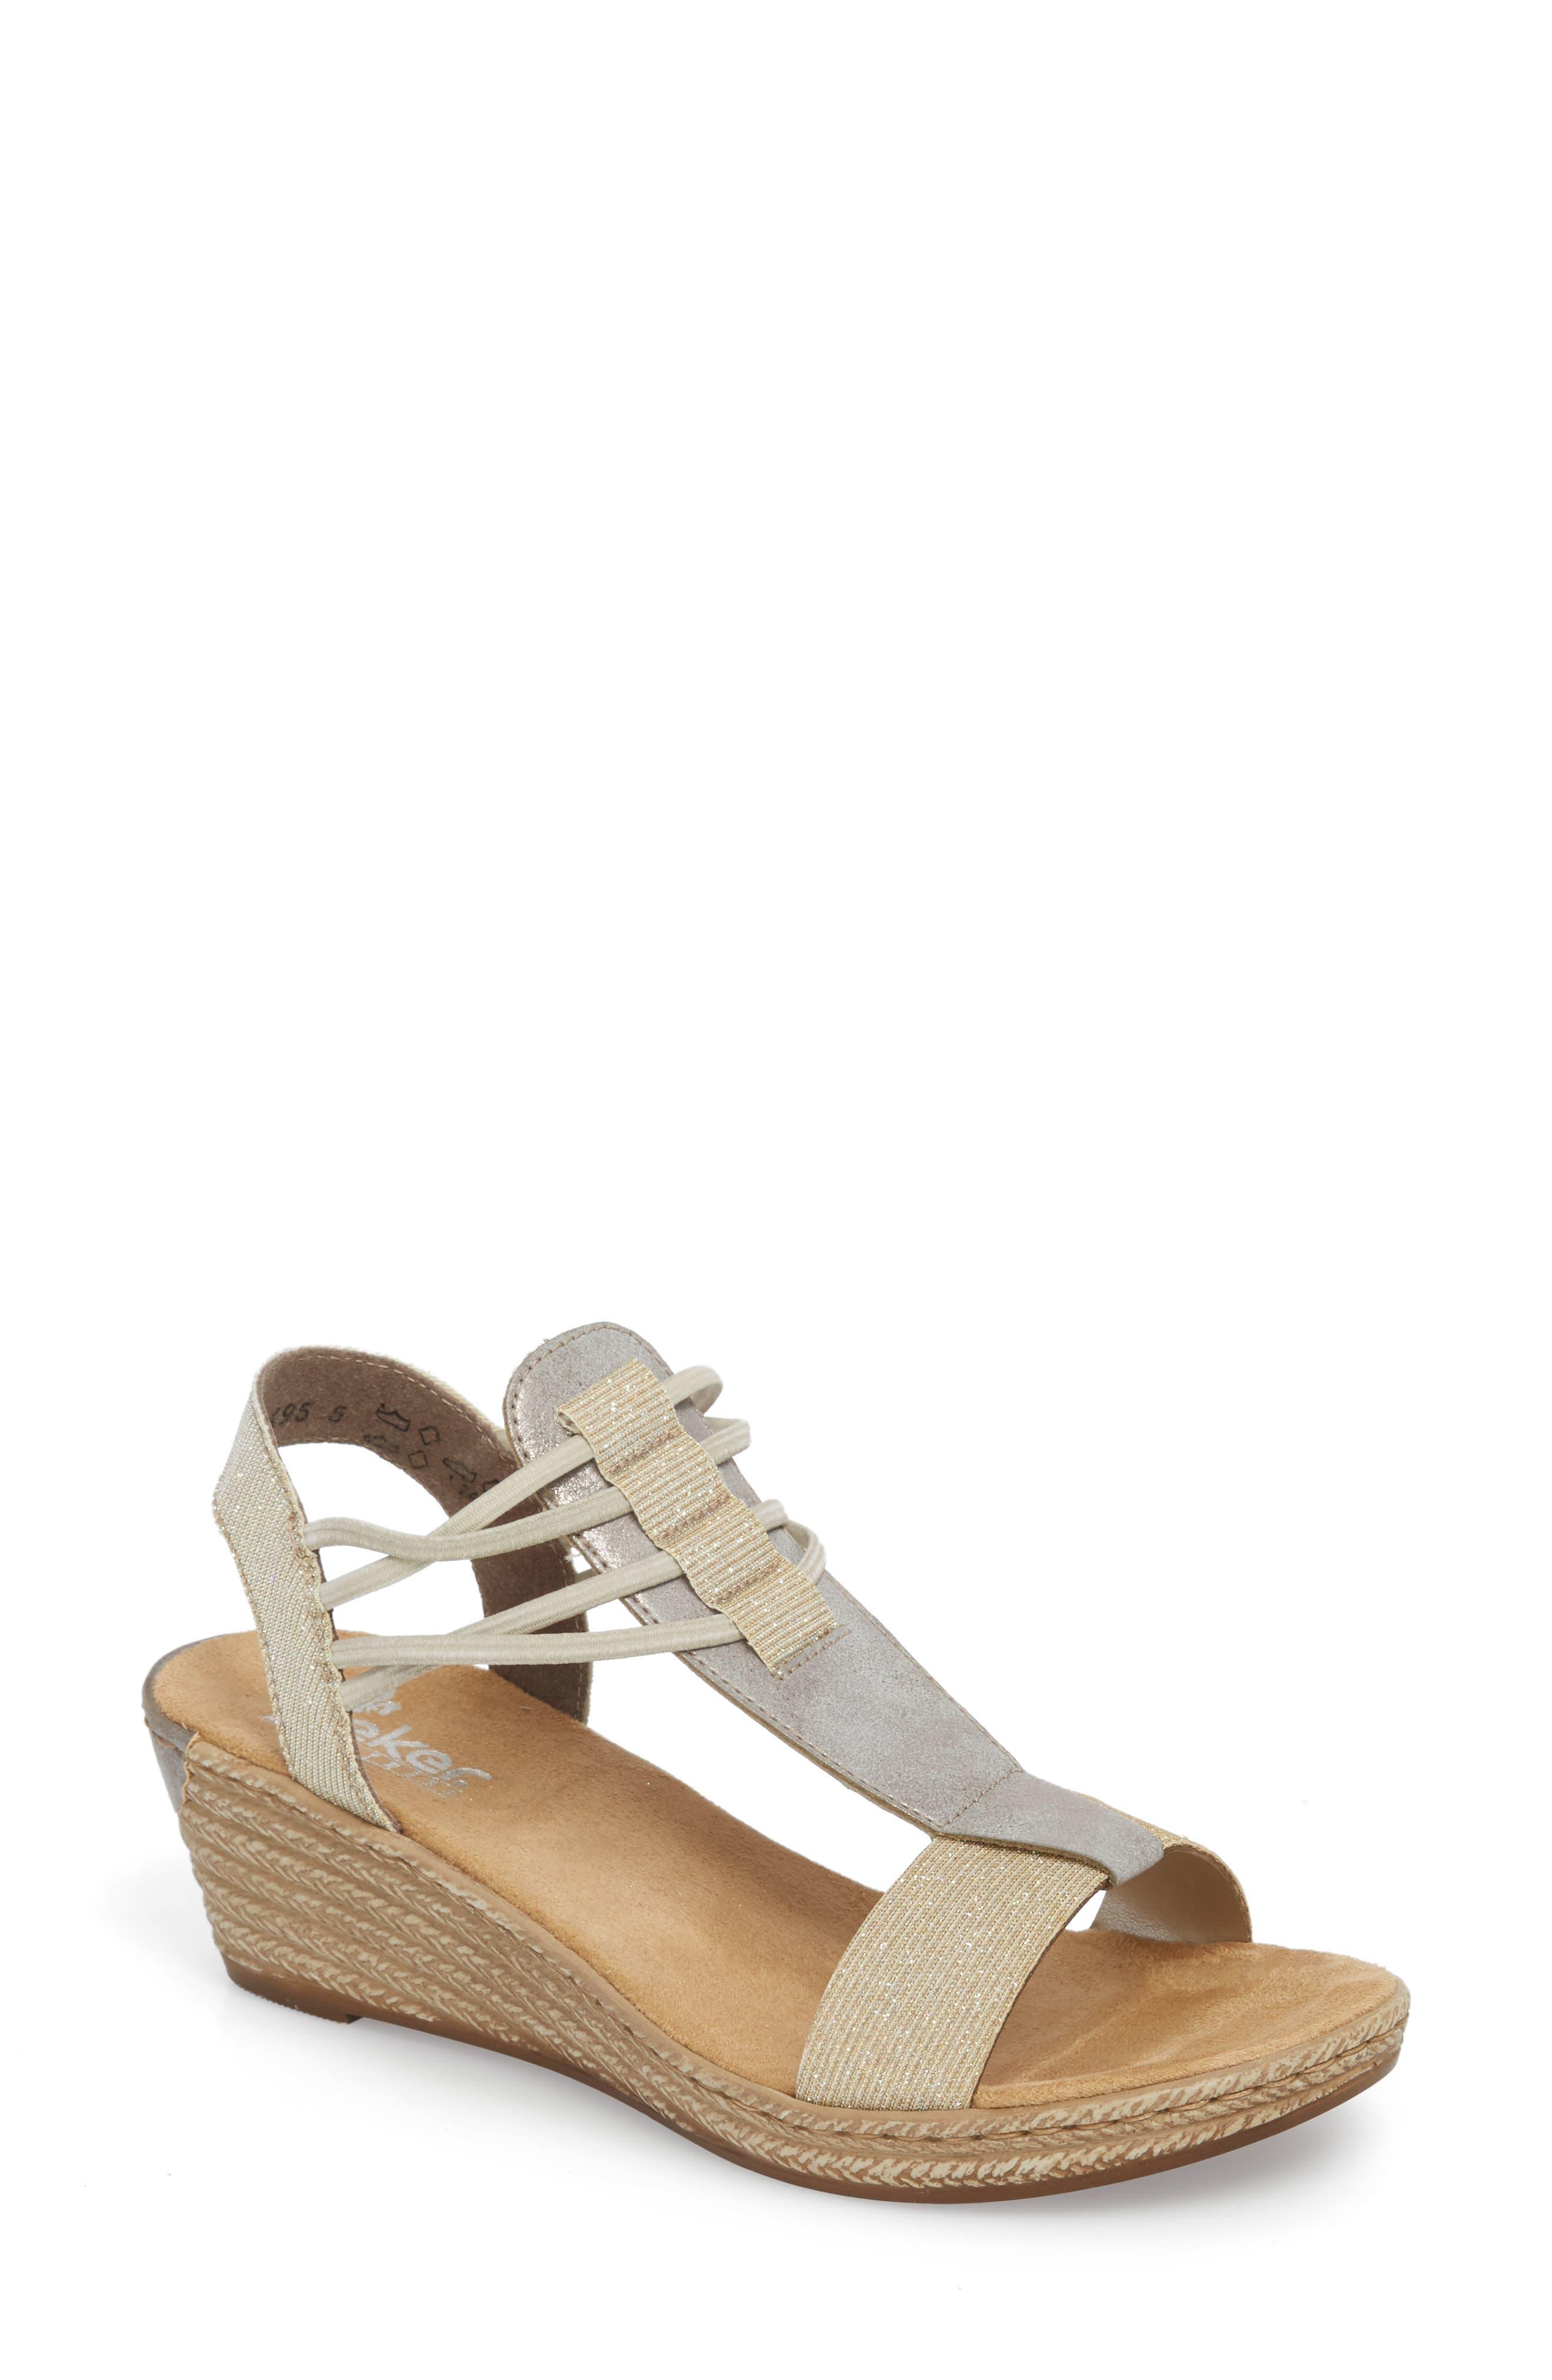 Fanni 22 Espadrille Wedge Sandal,                             Main thumbnail 1, color,                             Light Gold/ Grey Fabric